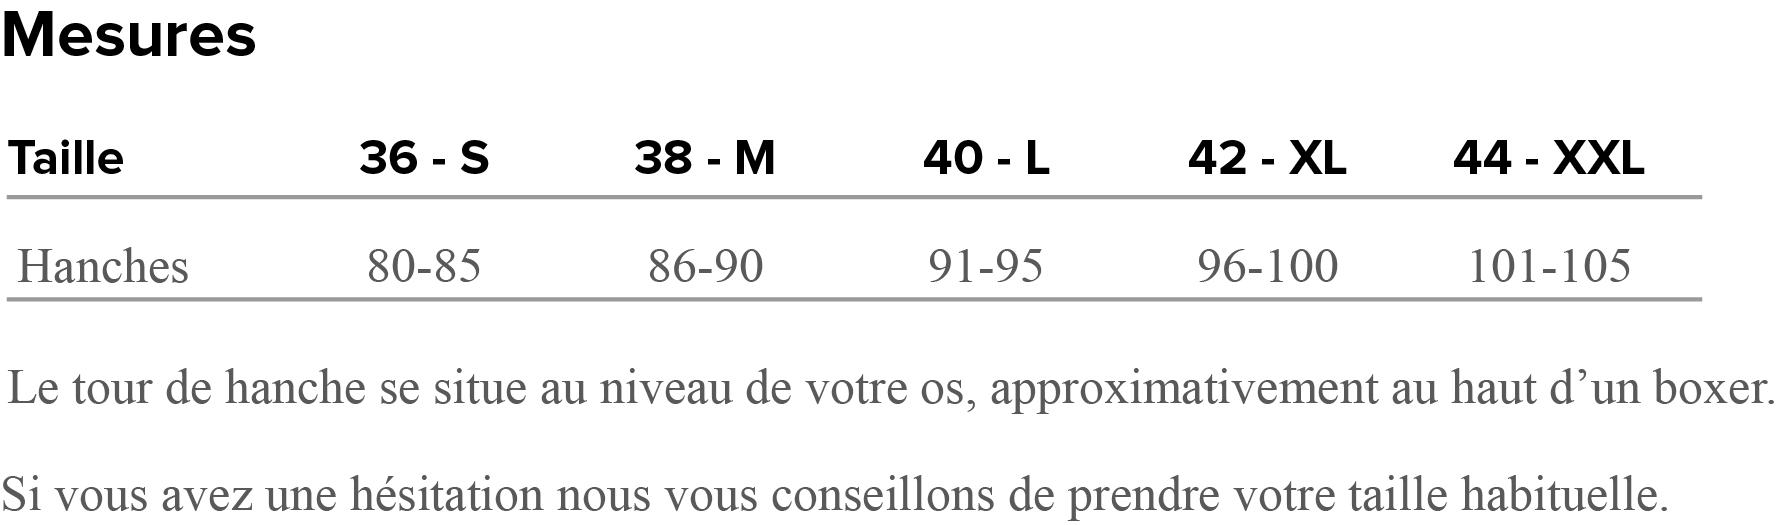 Guide_des_tailles_site_homme.png